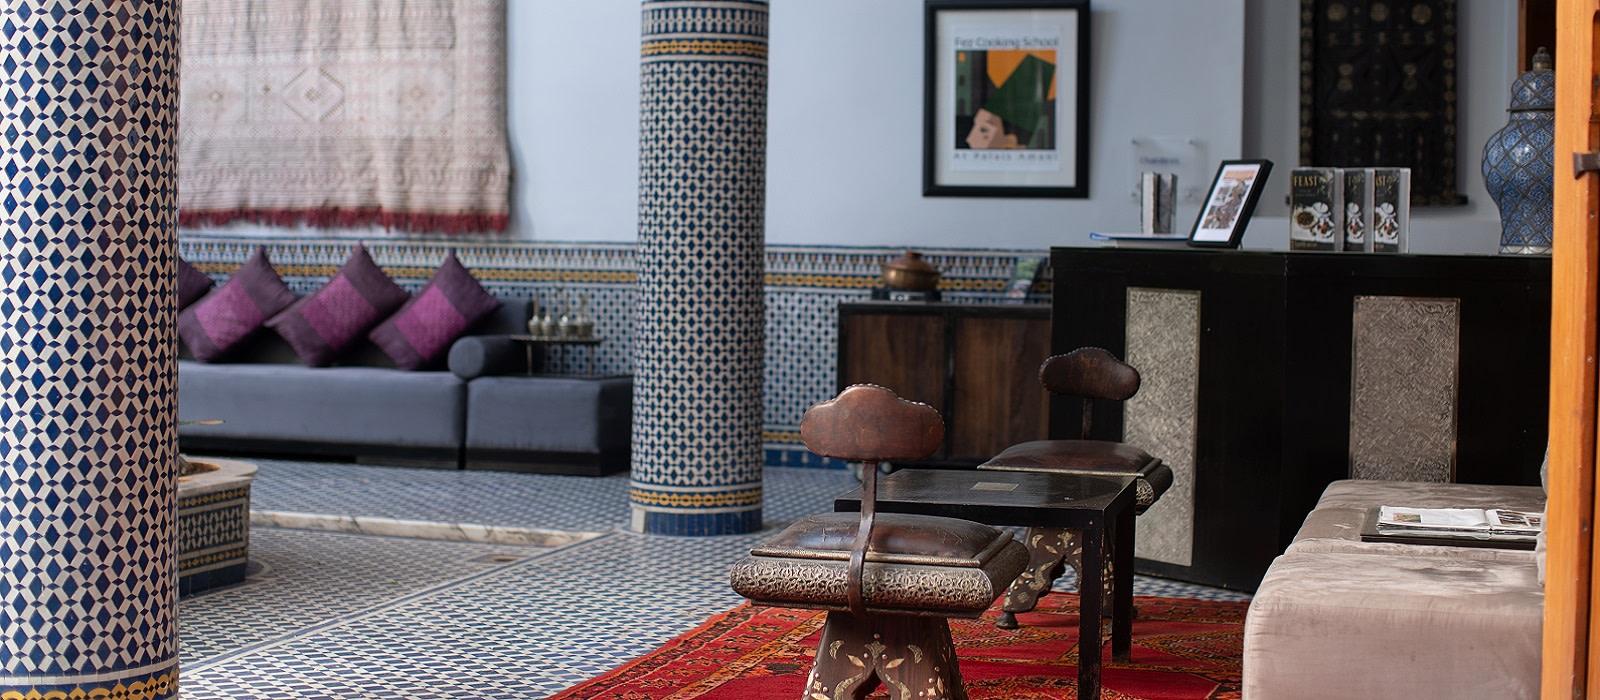 Hotel Palais Amani Morocco